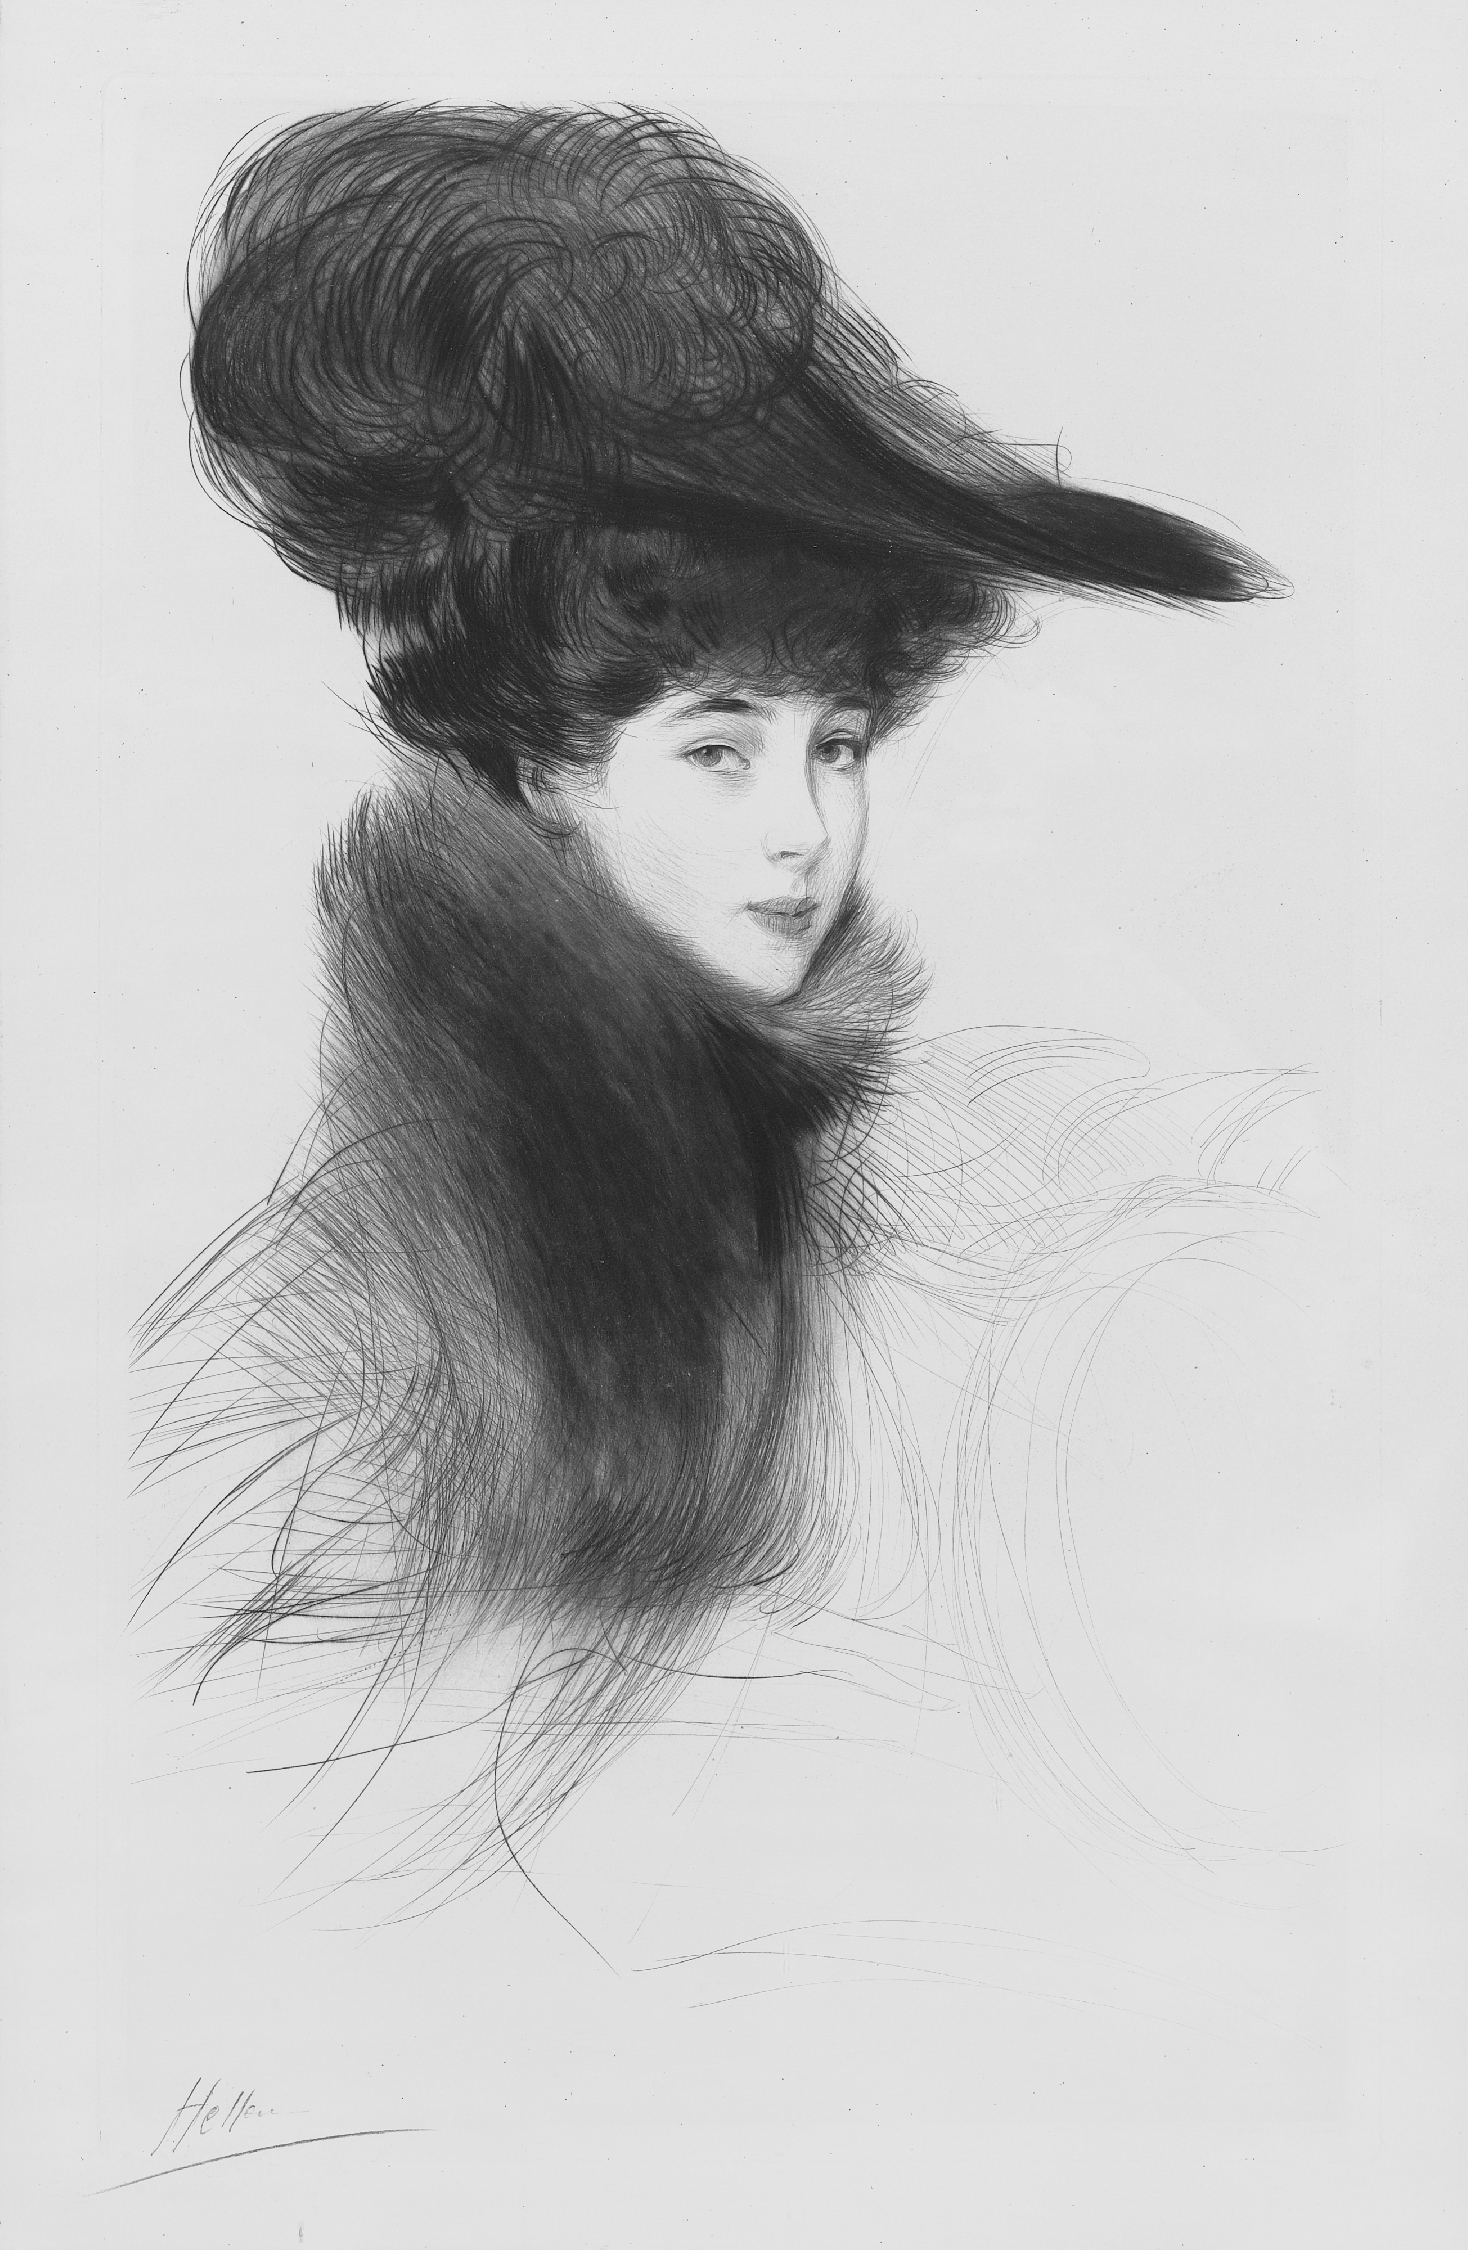 https://upload.wikimedia.org/wikipedia/commons/f/f2/La_Duchesse_de_Marlborough%2C_Consuelo_Vanderbilt%2C_by_Helleu%2C_1901.jpg